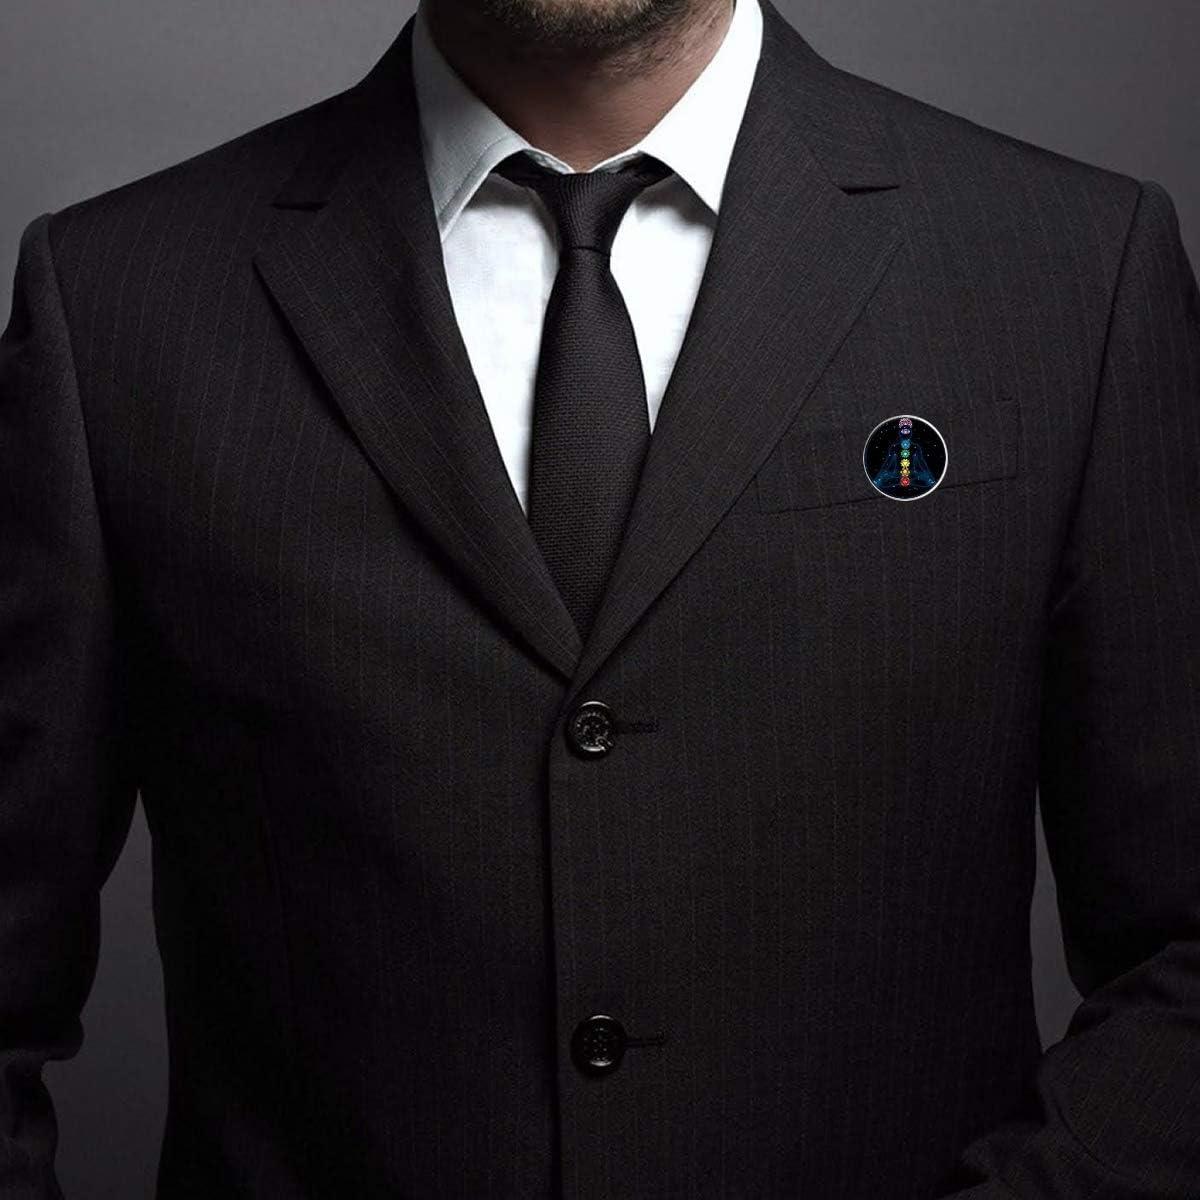 Pinback Buttons Badges Pins Reiki Chakra Healing Yoga Lapel Pin Brooch Clip Trendy Accessory Jacket T-Shirt Bag Hat Shoe